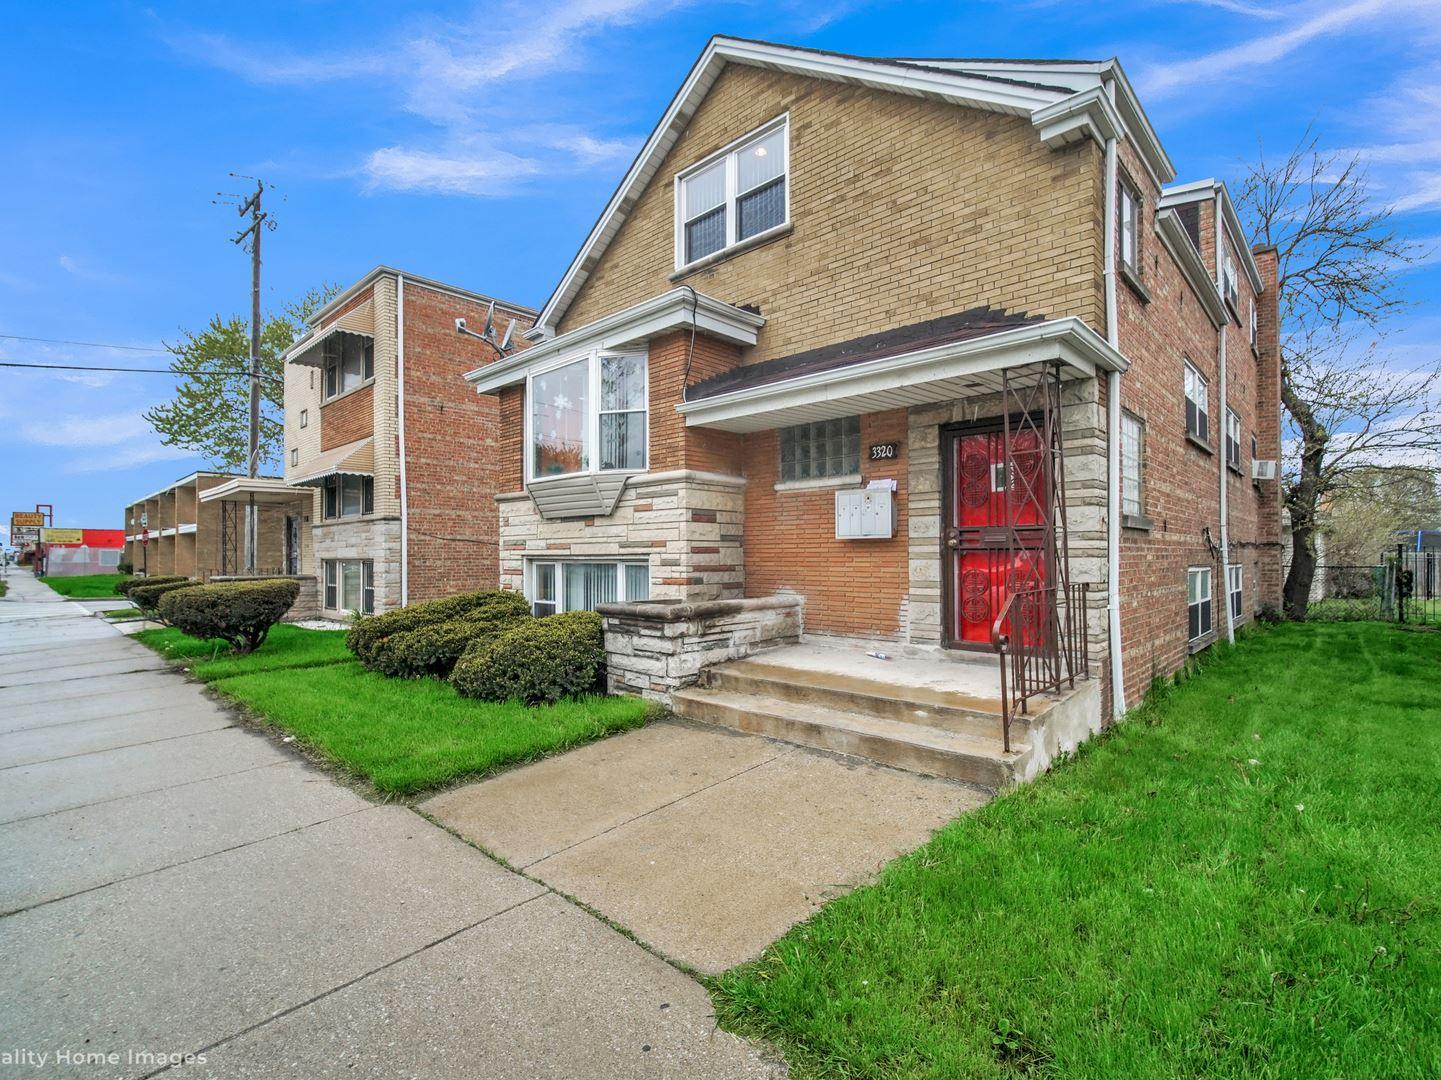 3320 W 79th Street, Chicago, IL 60652 - #: 10701132